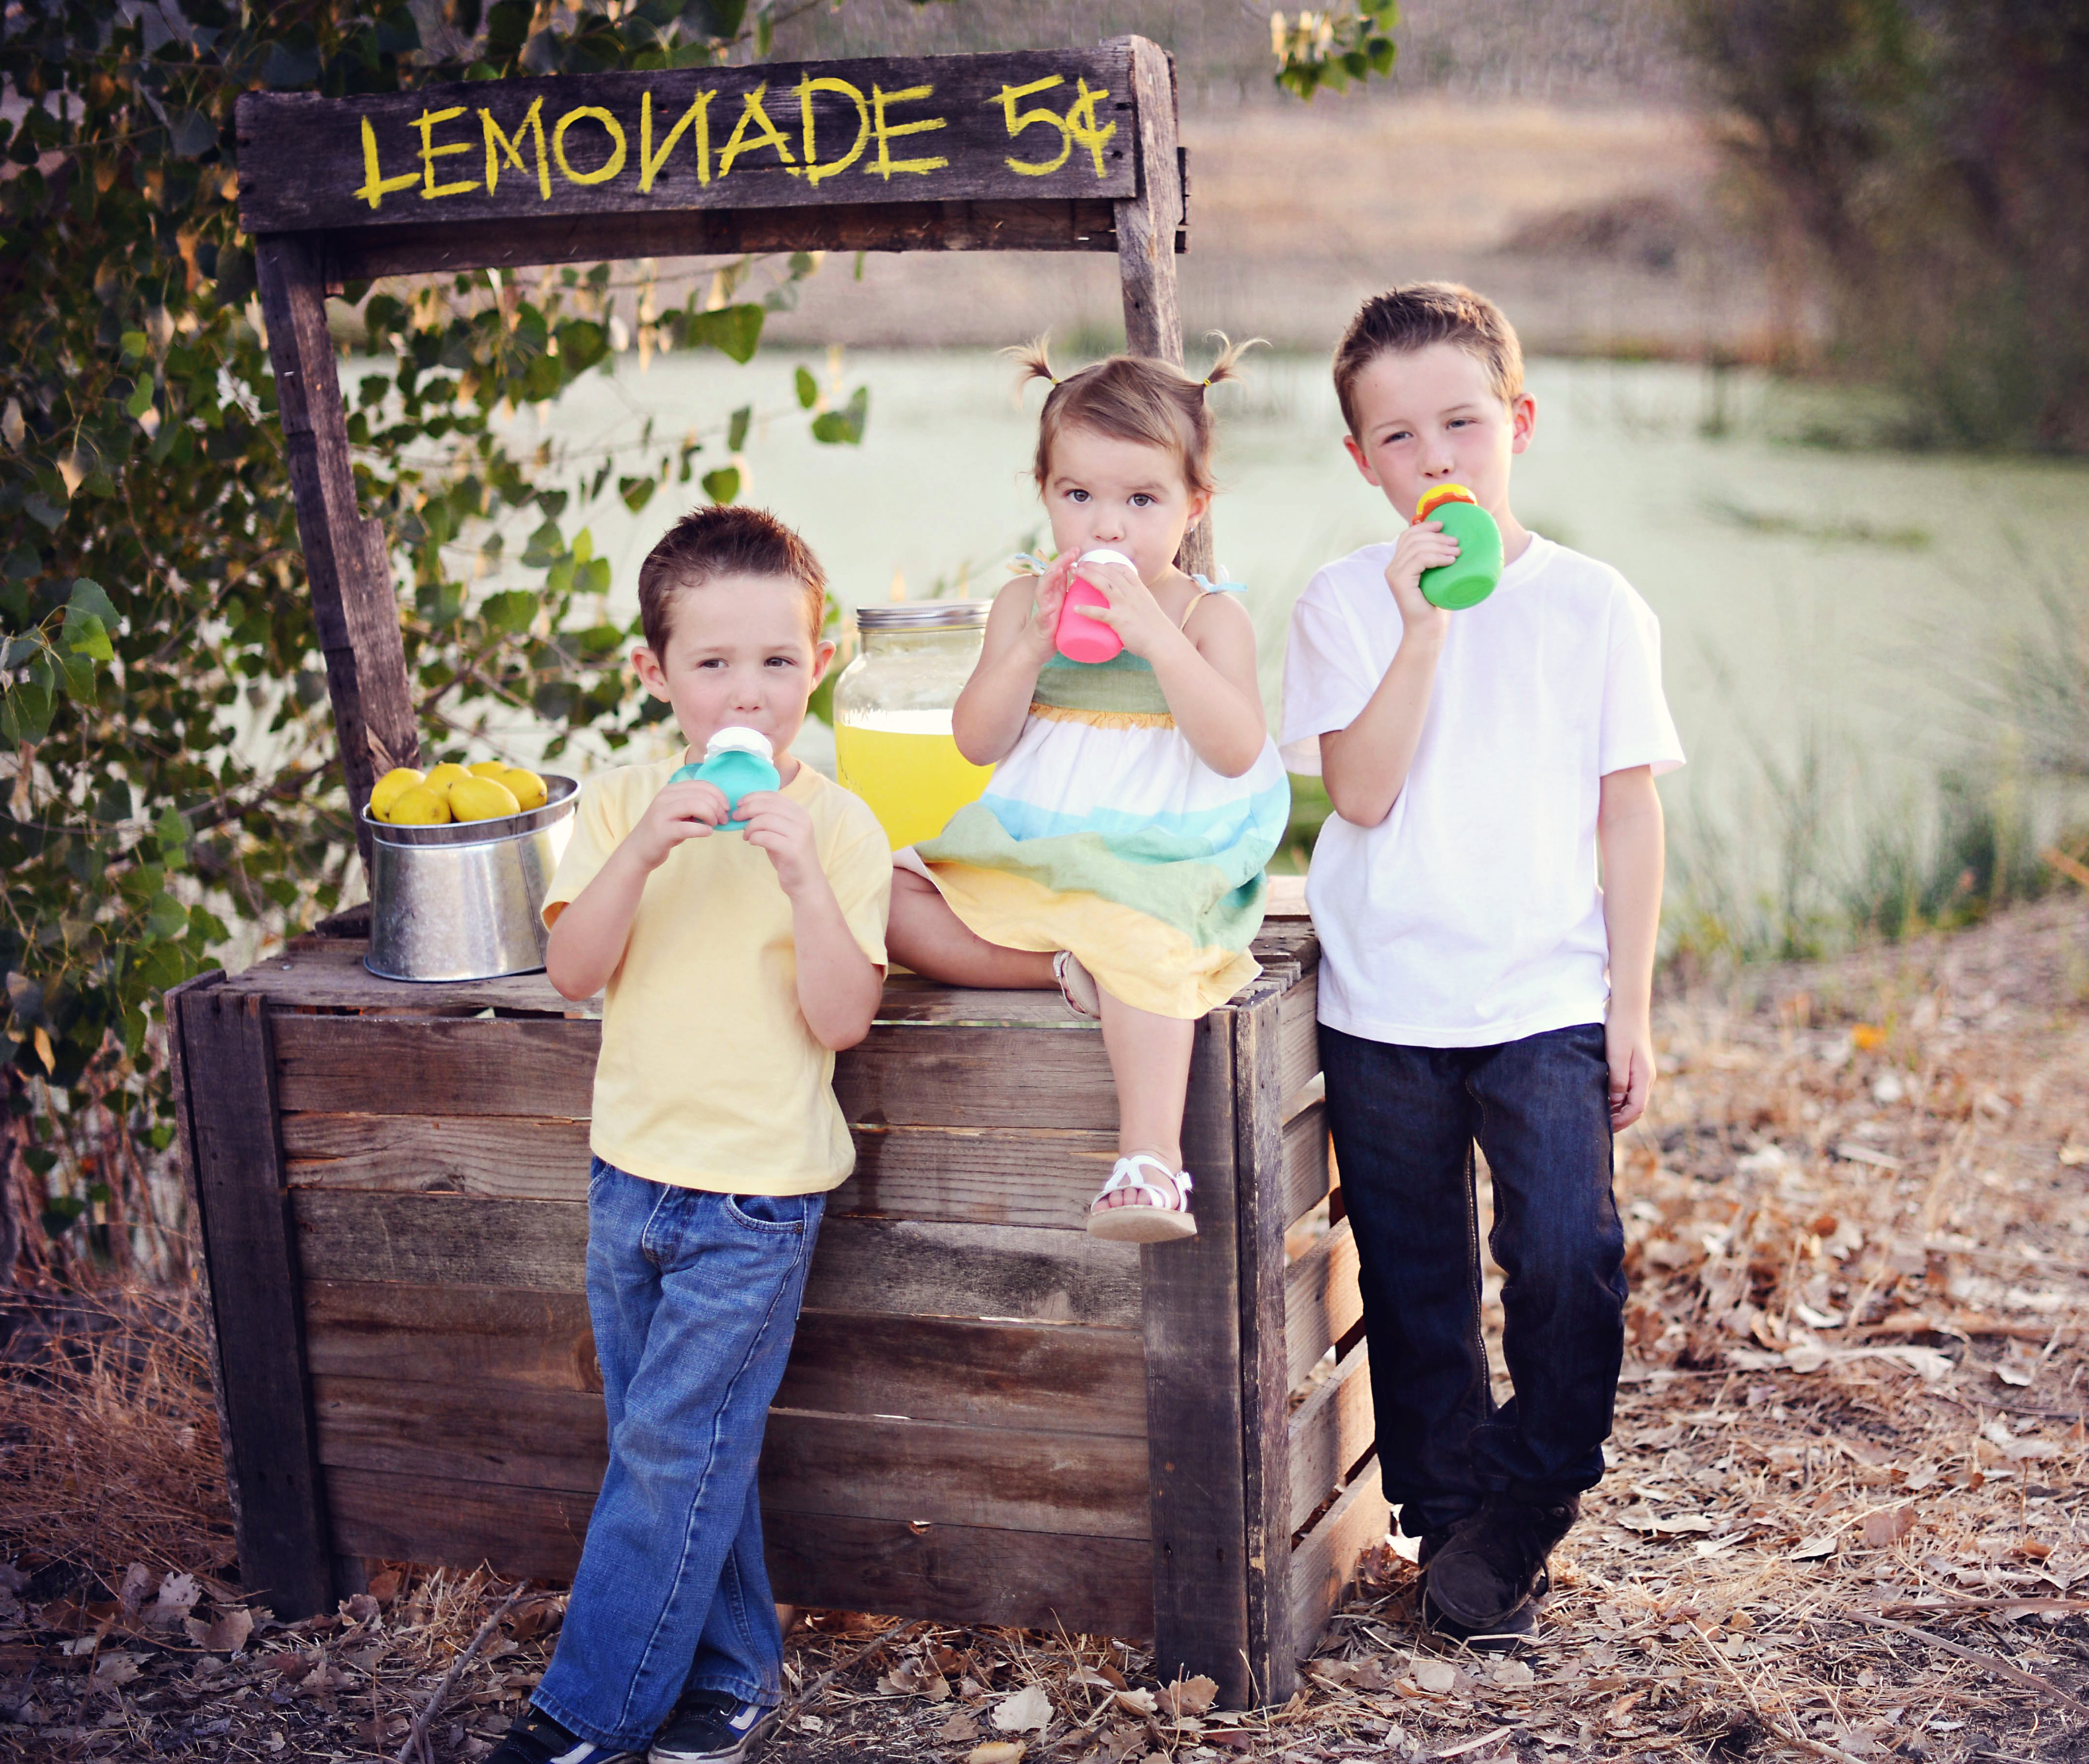 3 kids lemonade stand